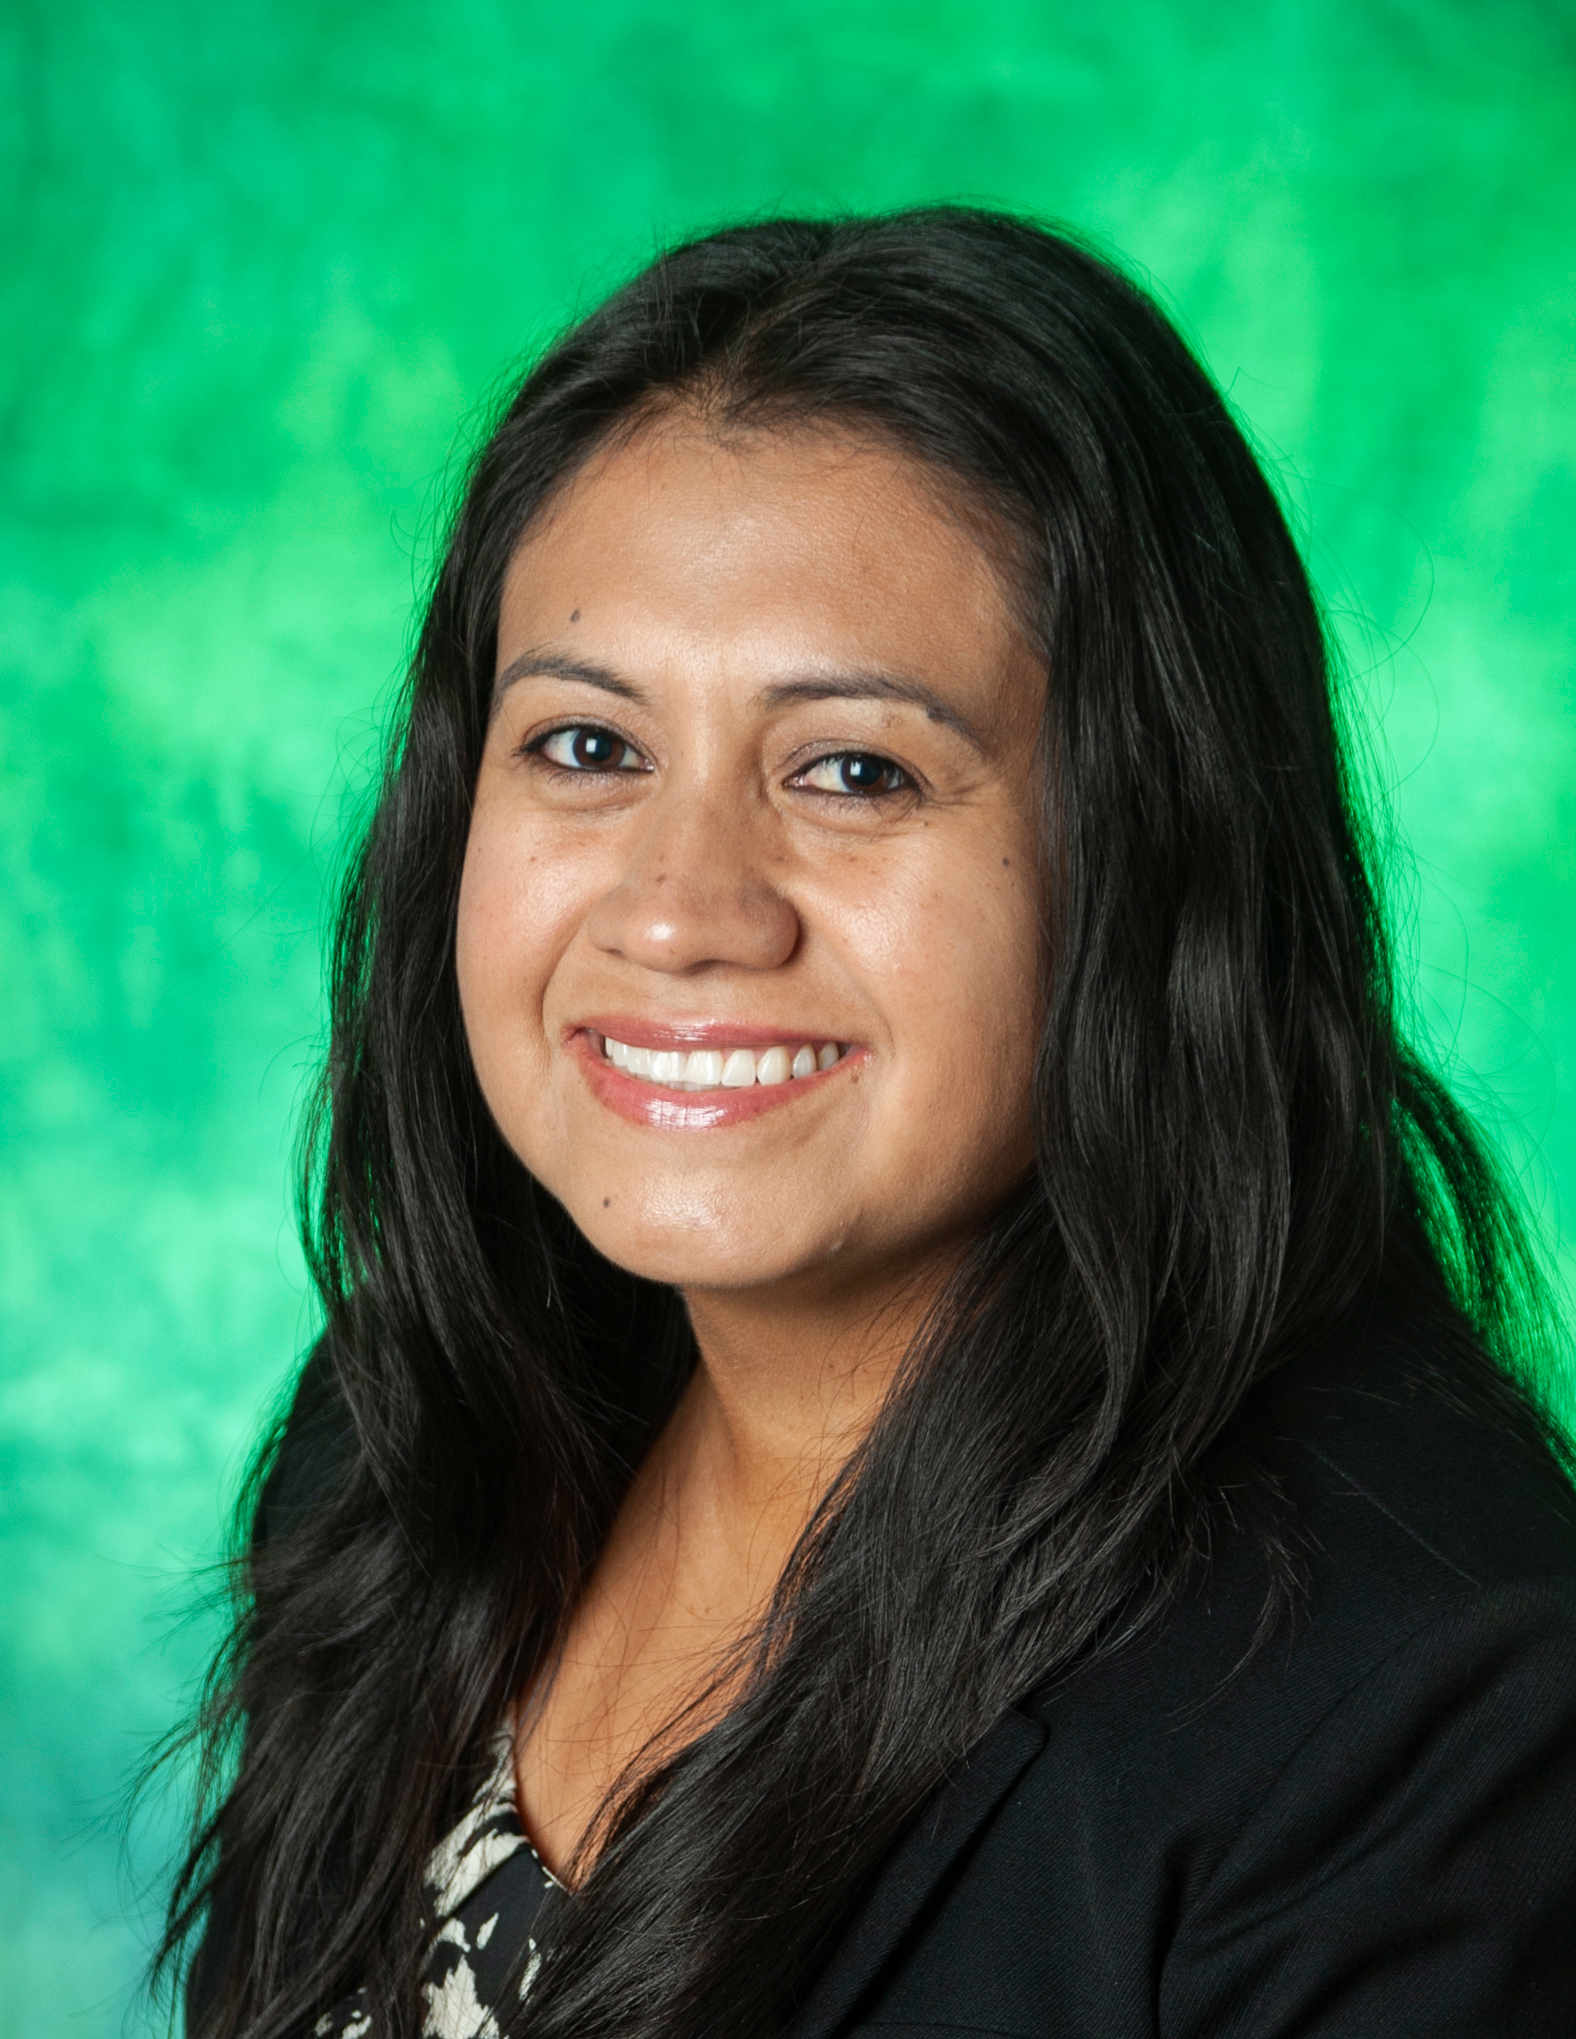 The Interim Director of the McNair Program, Rosa Fonseca